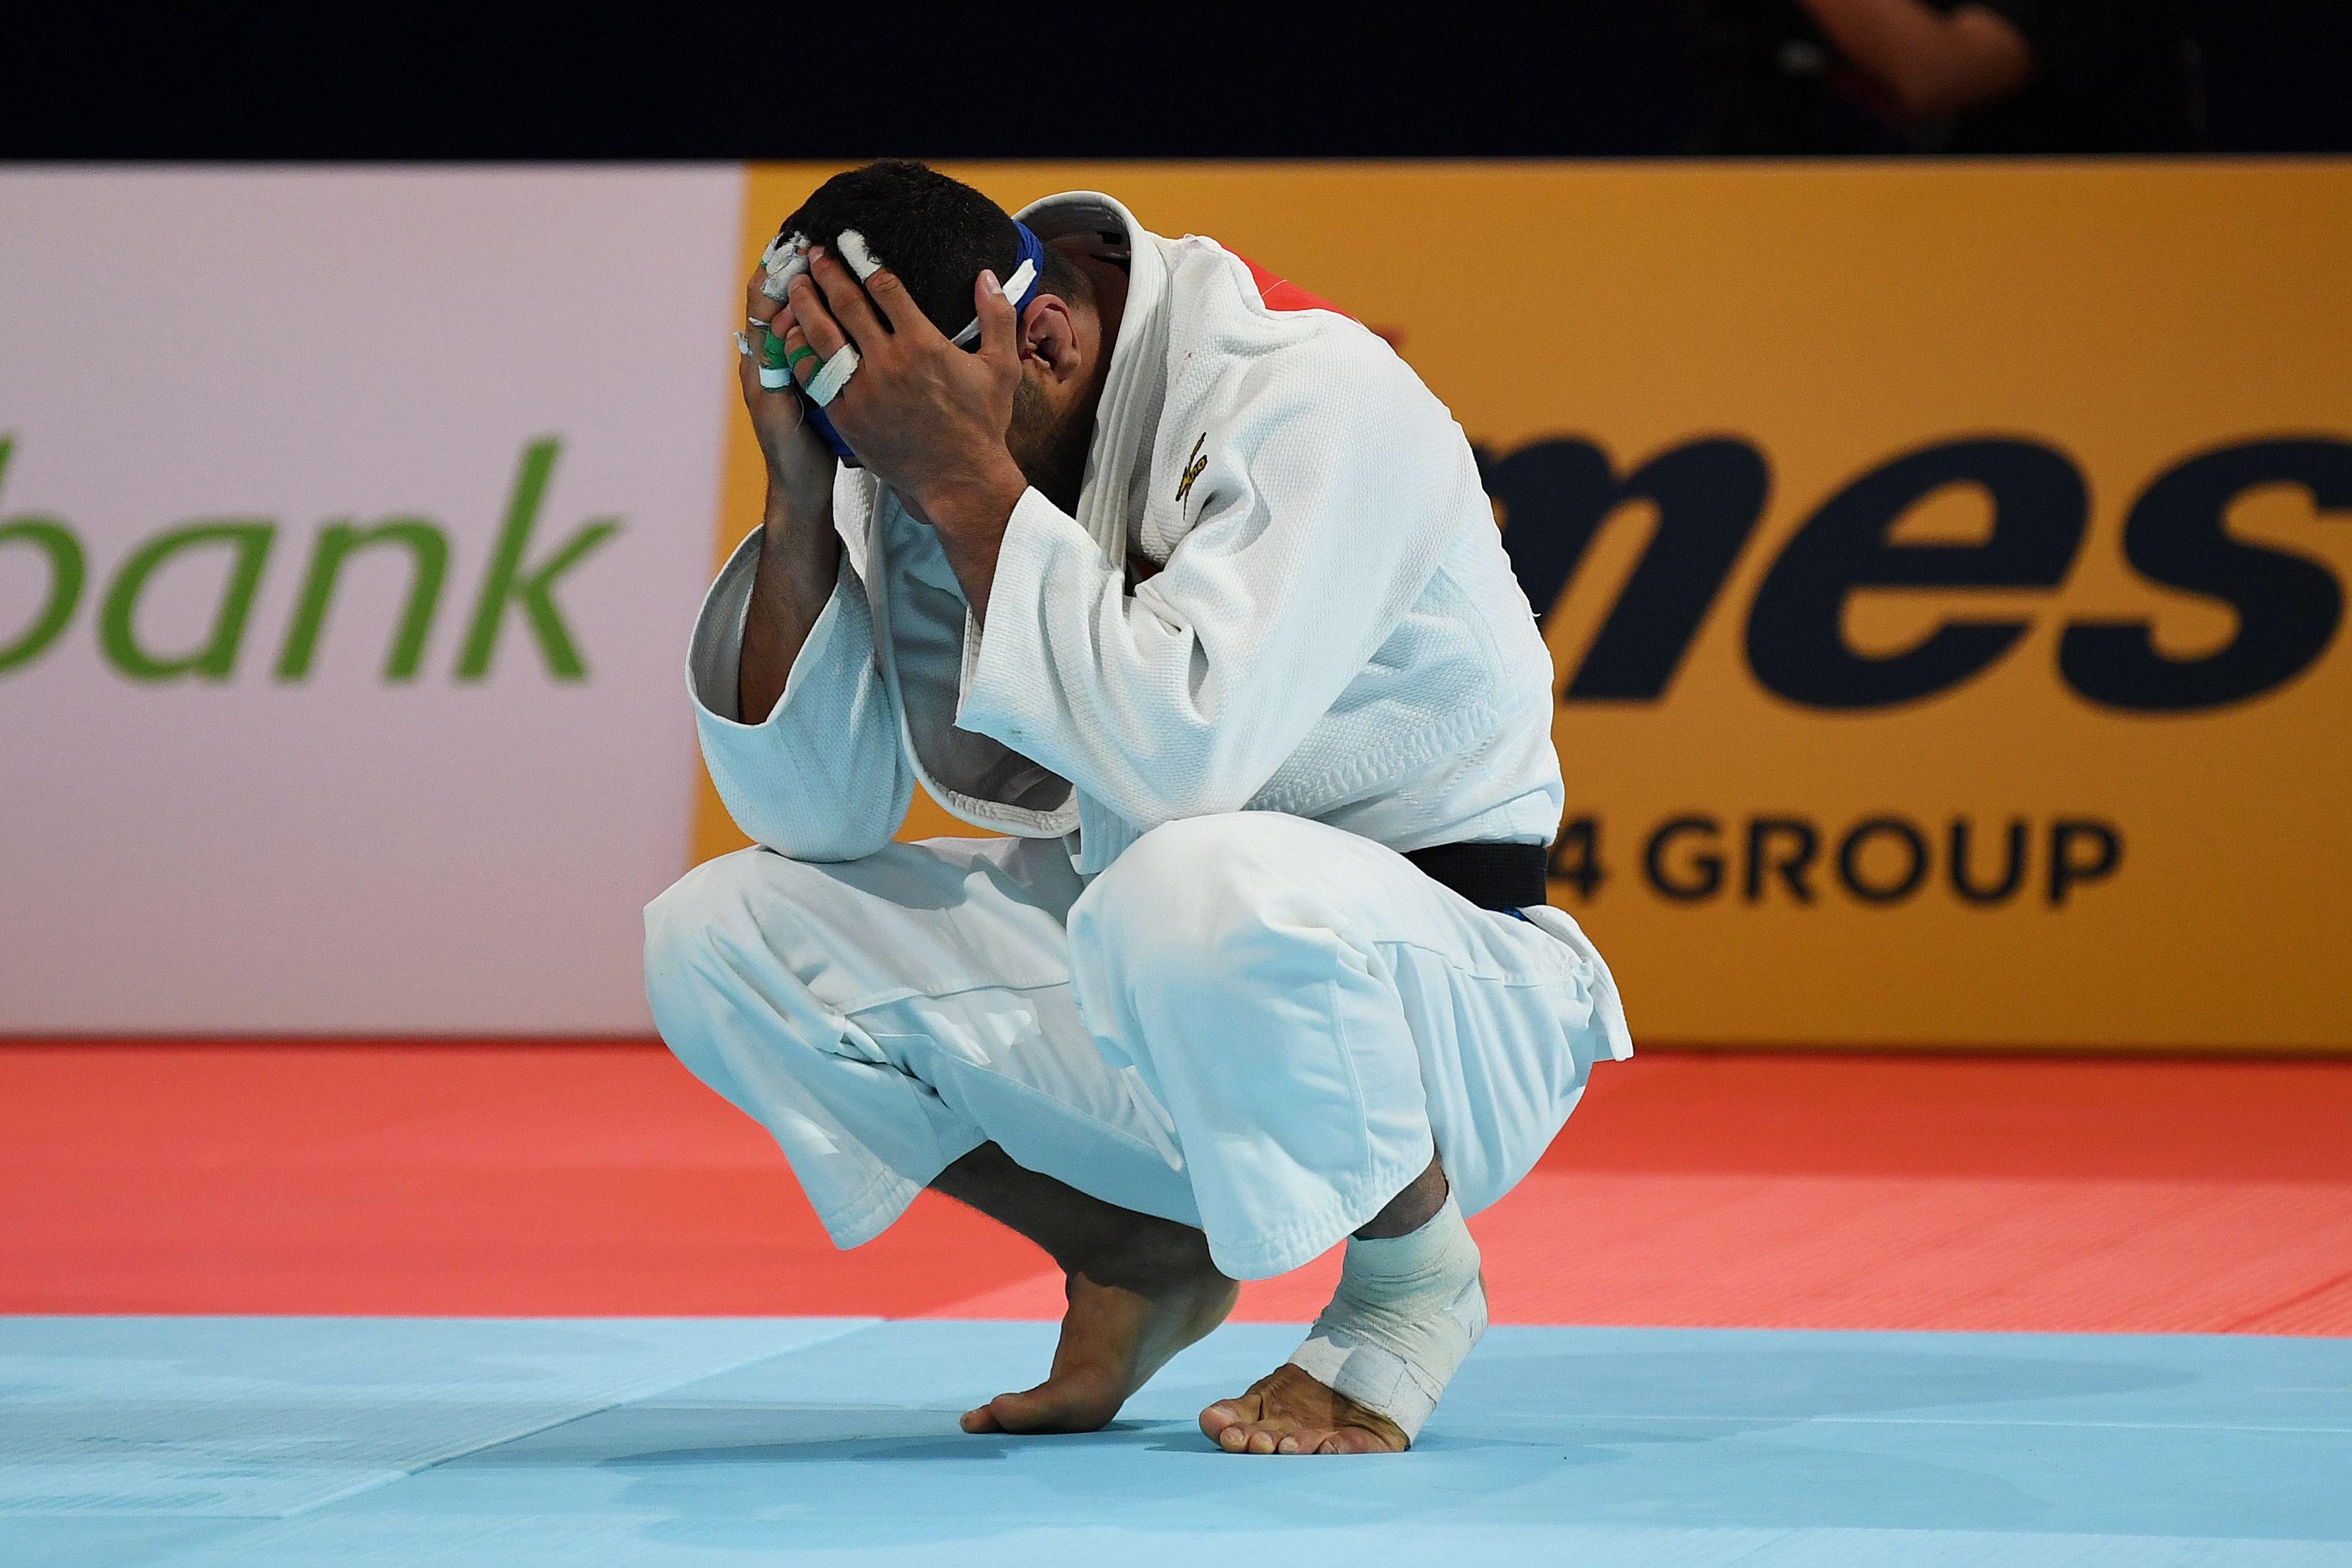 Saeid Mollaei who represented Iran in judo.